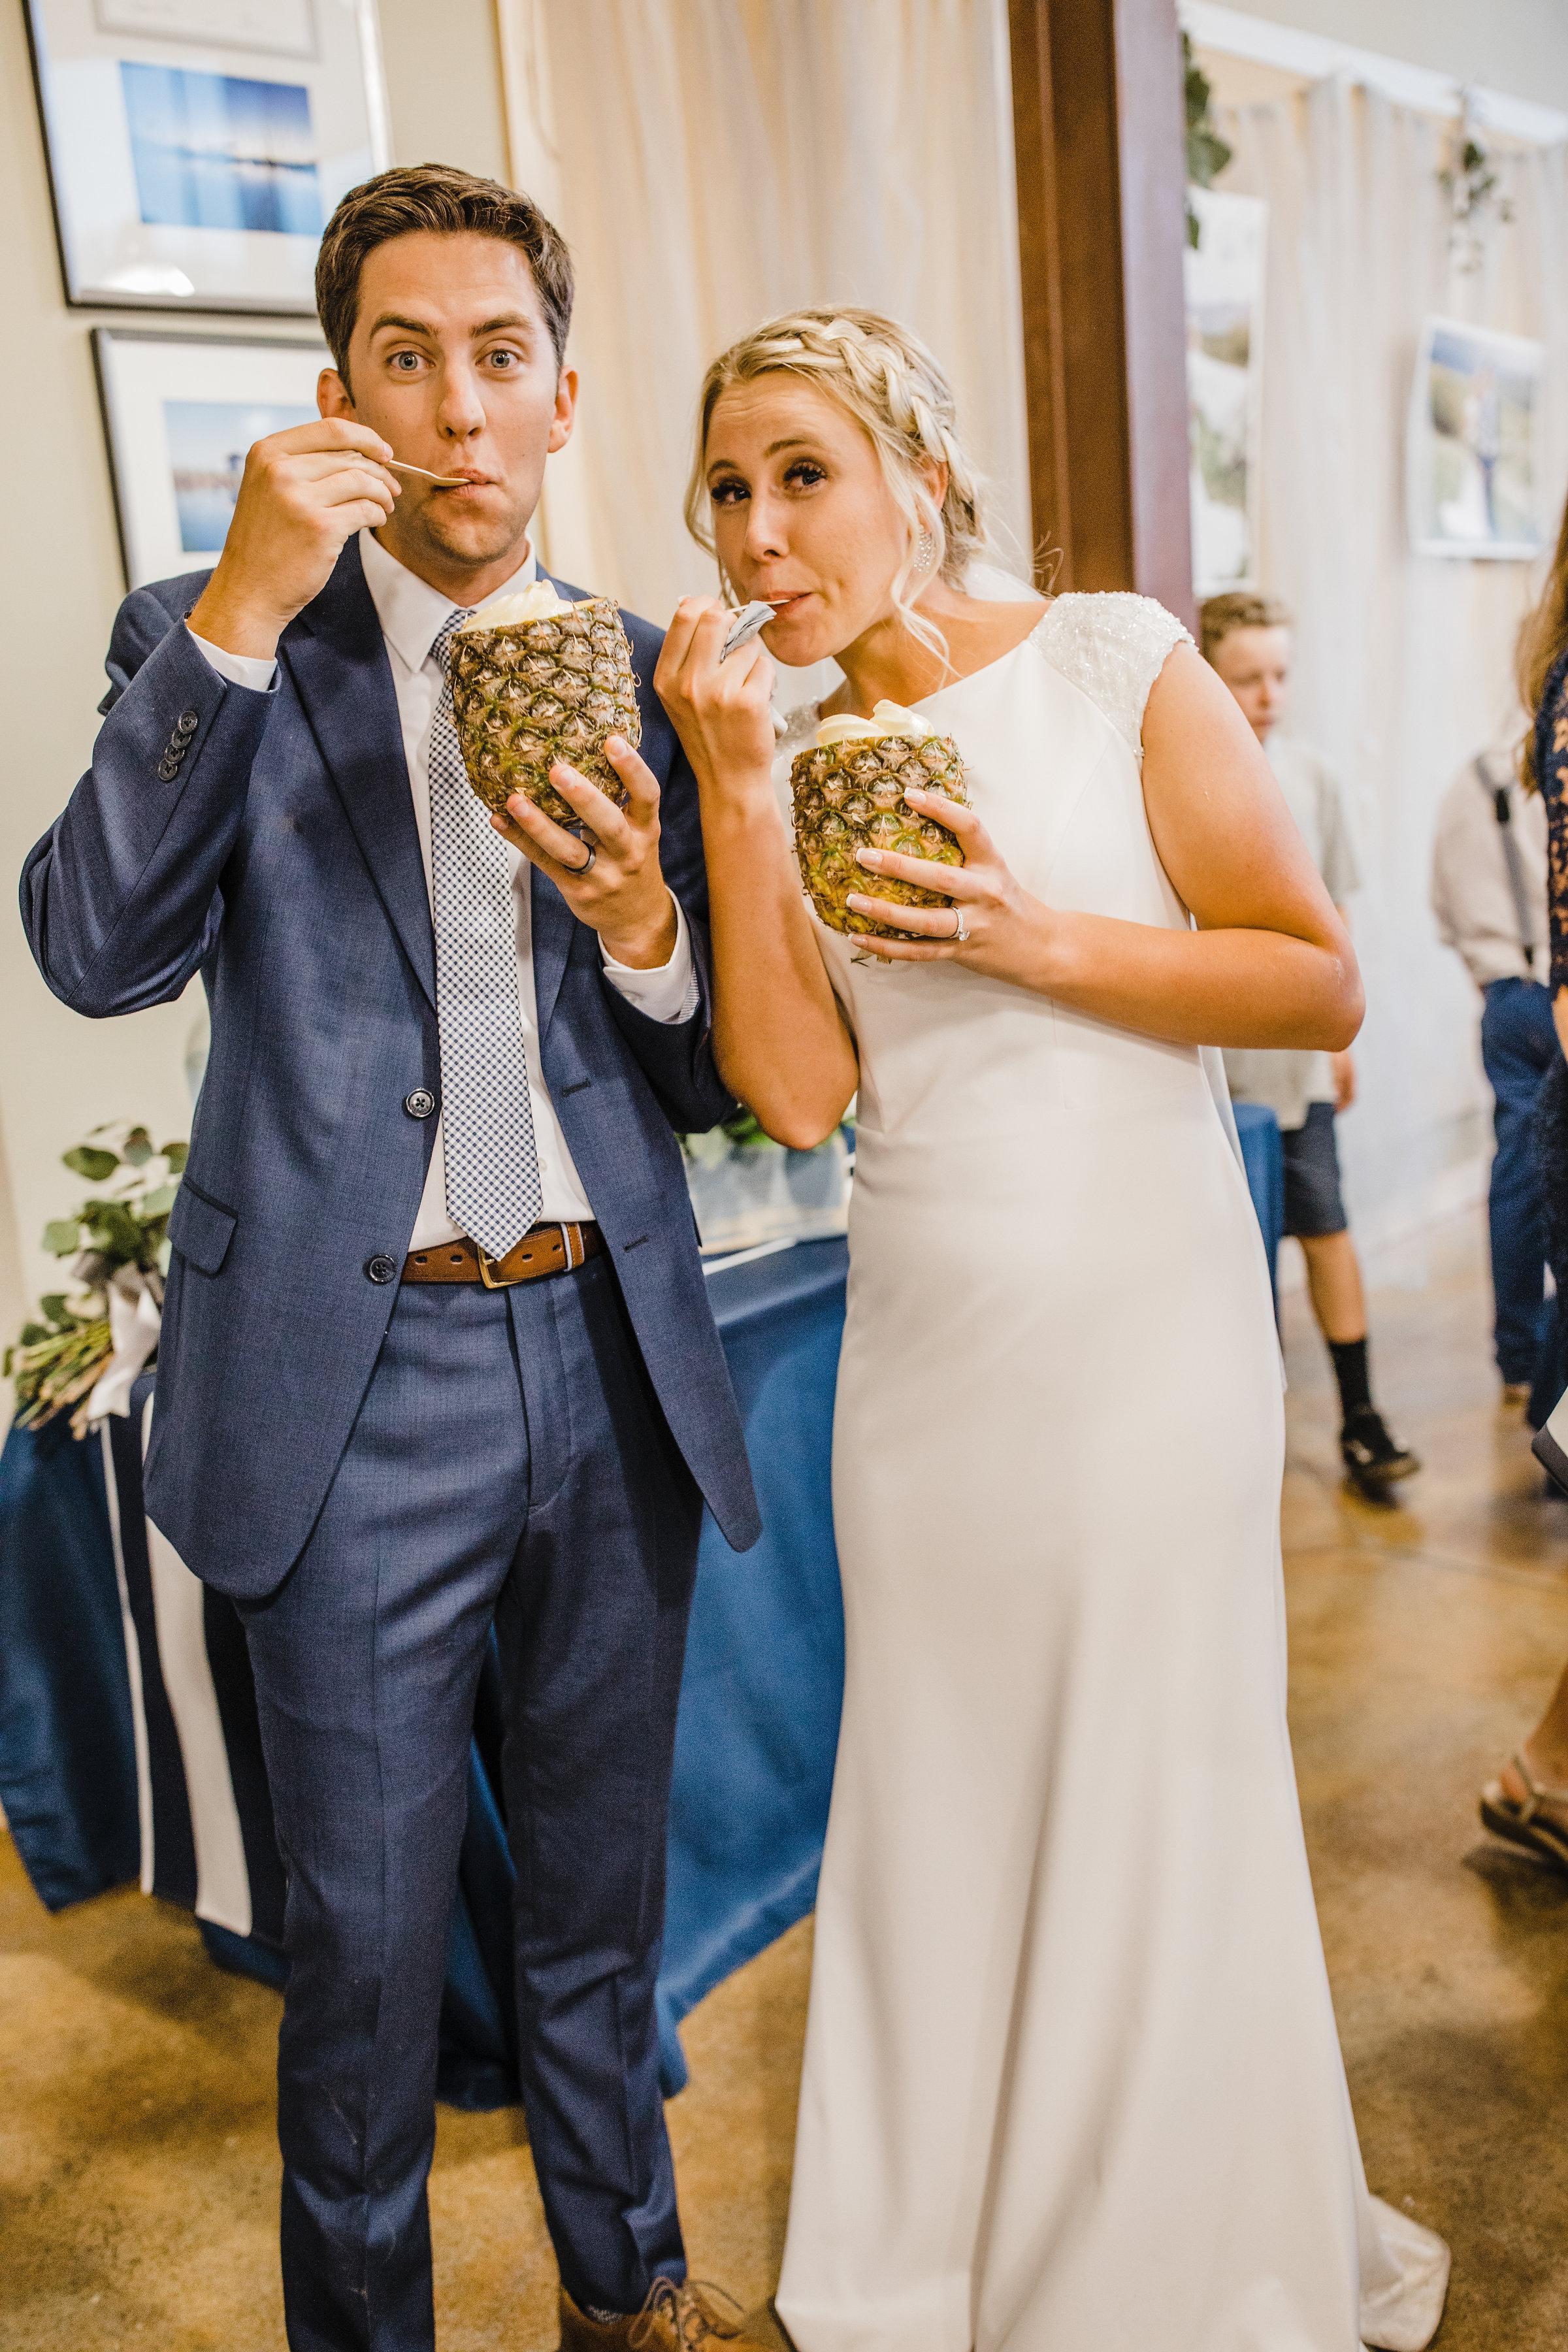 wedding photographer in salt lake city happy dole whip reception